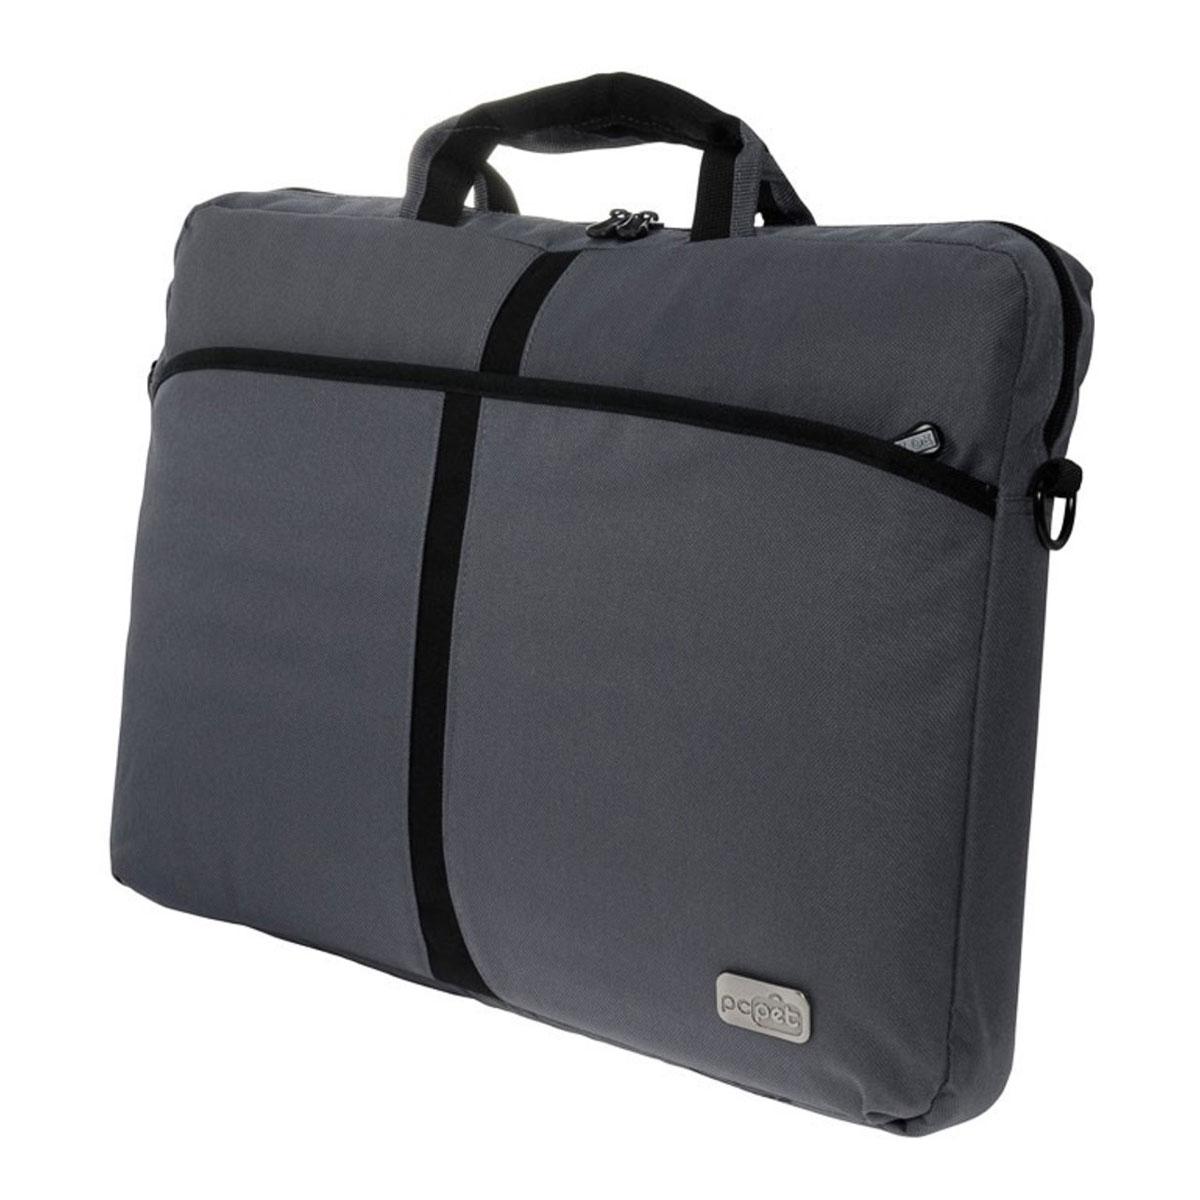 Сумка для ноутбука 17 PC Pet 600D, Grey (PCP-A1317GY) pc pet 600d 15 4